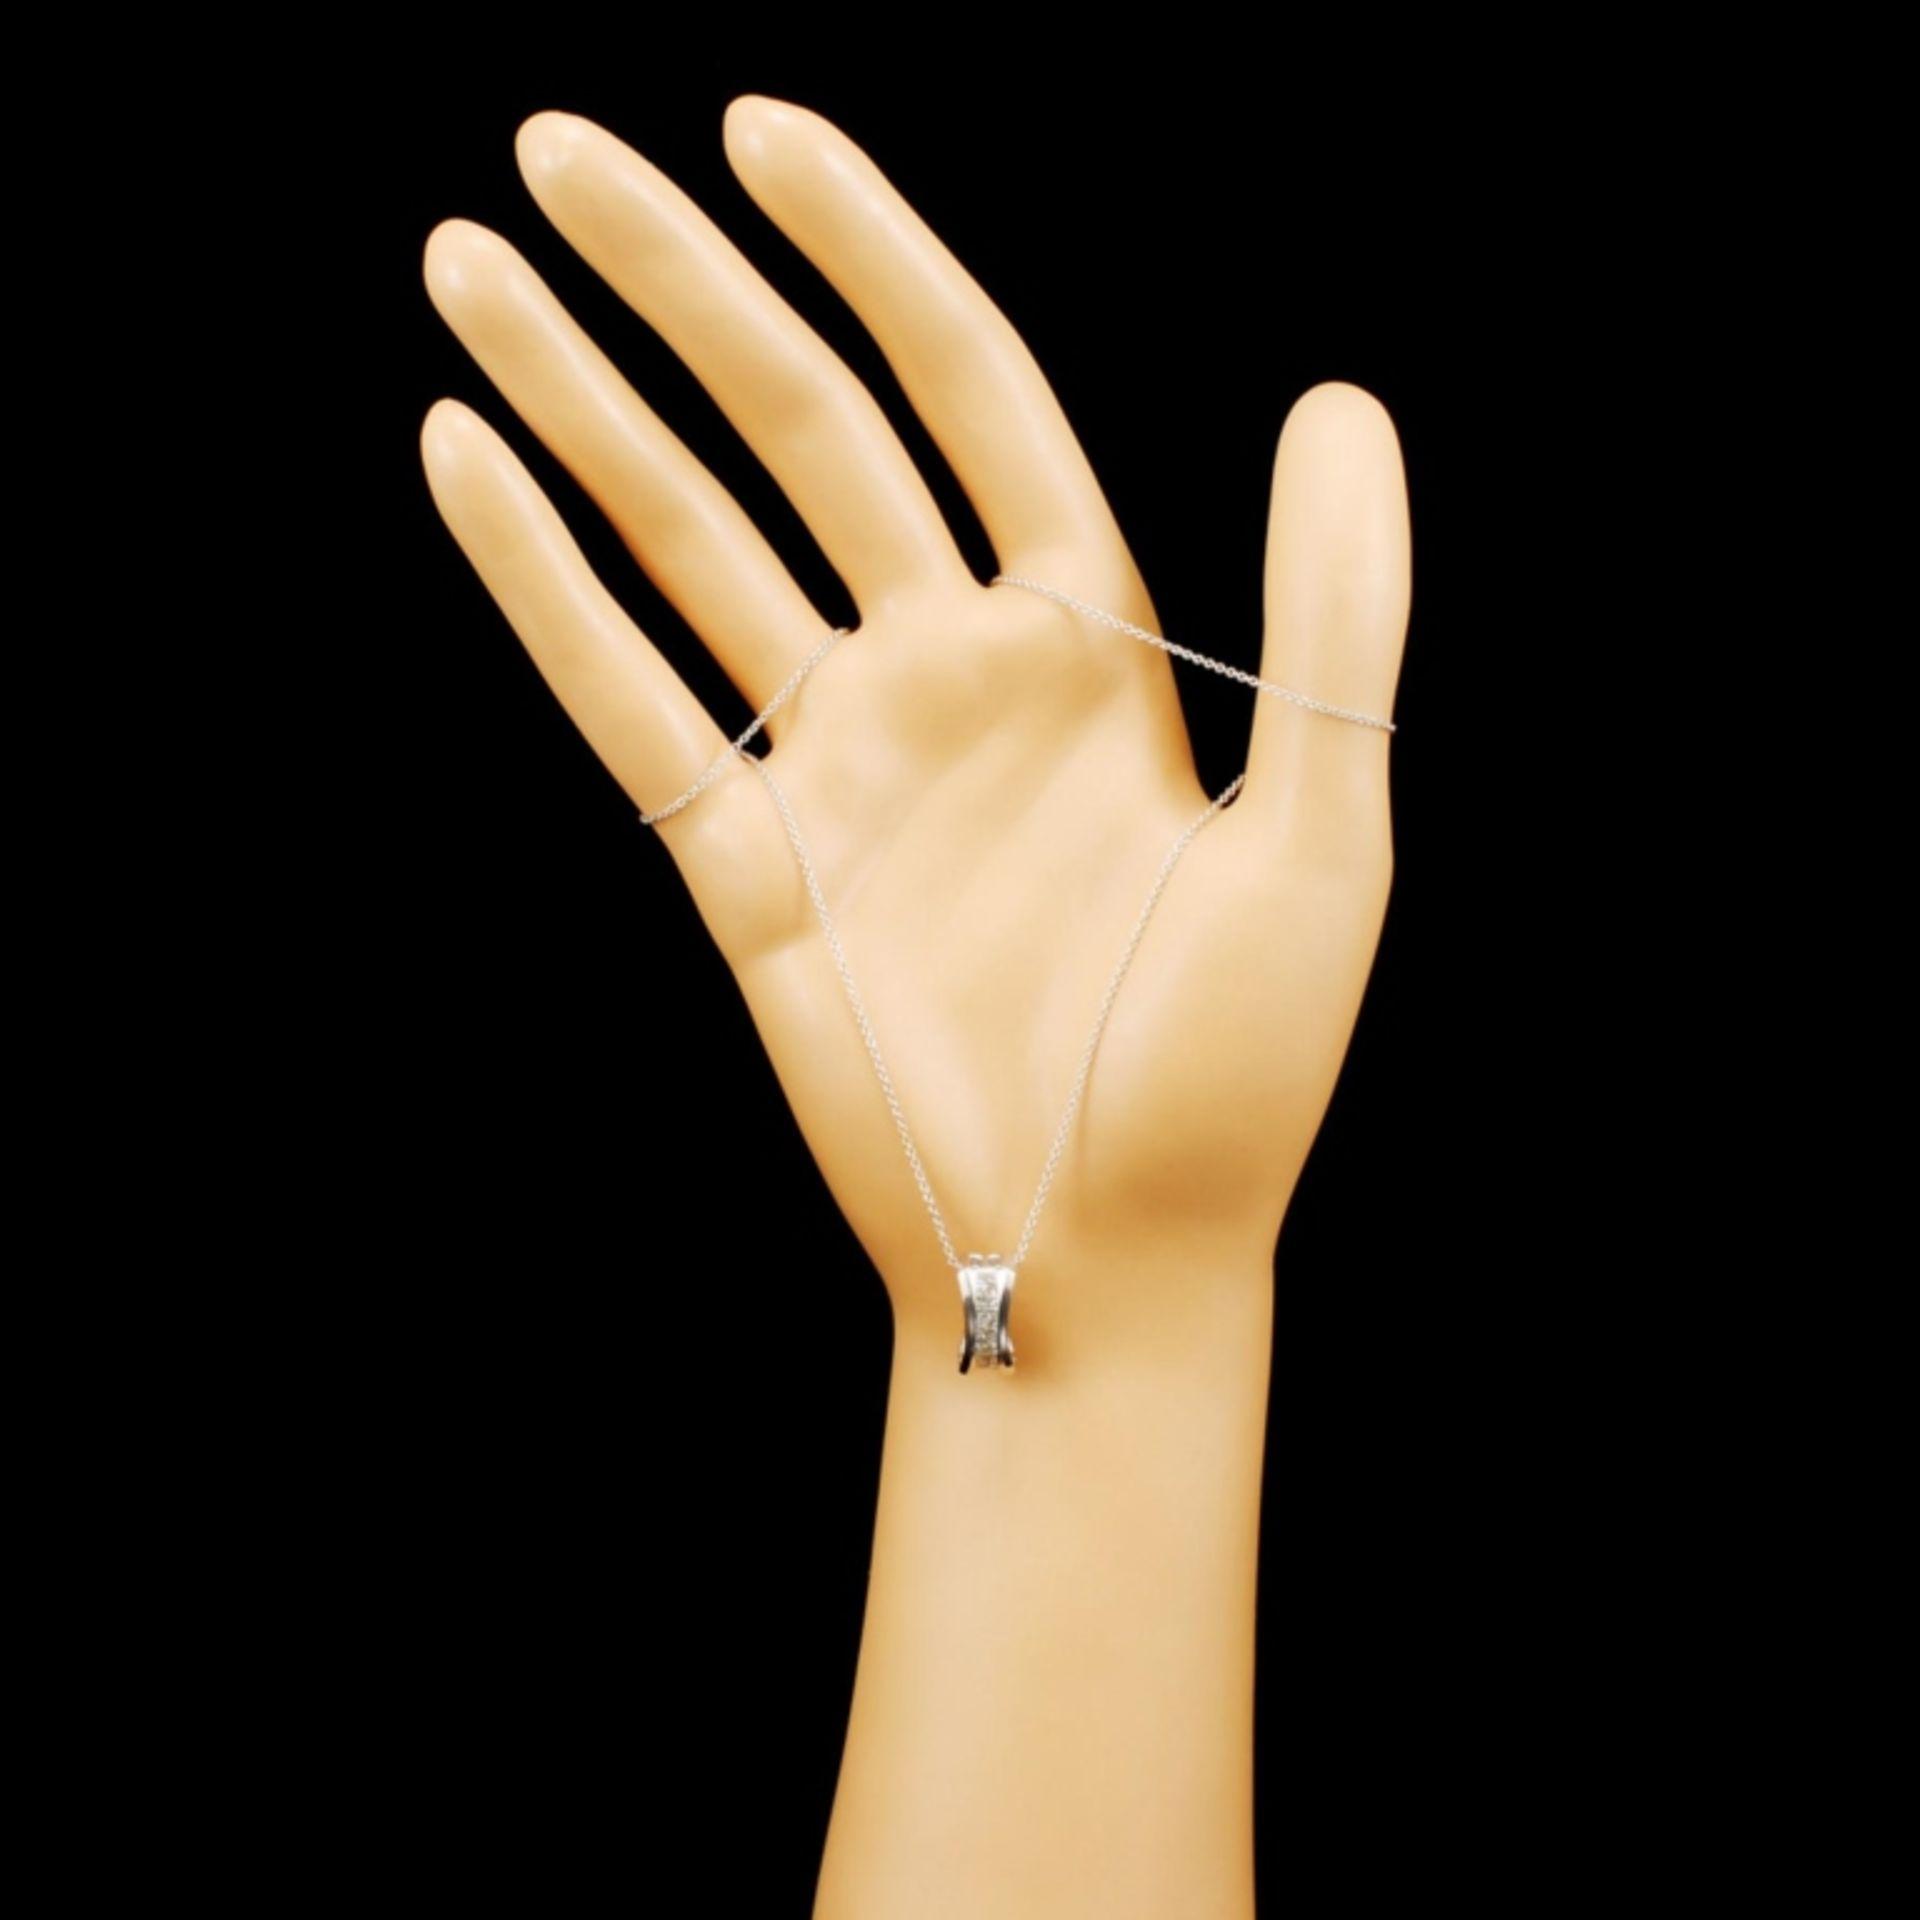 14K Gold 0.43ctw Diamond Pendant - Image 3 of 4